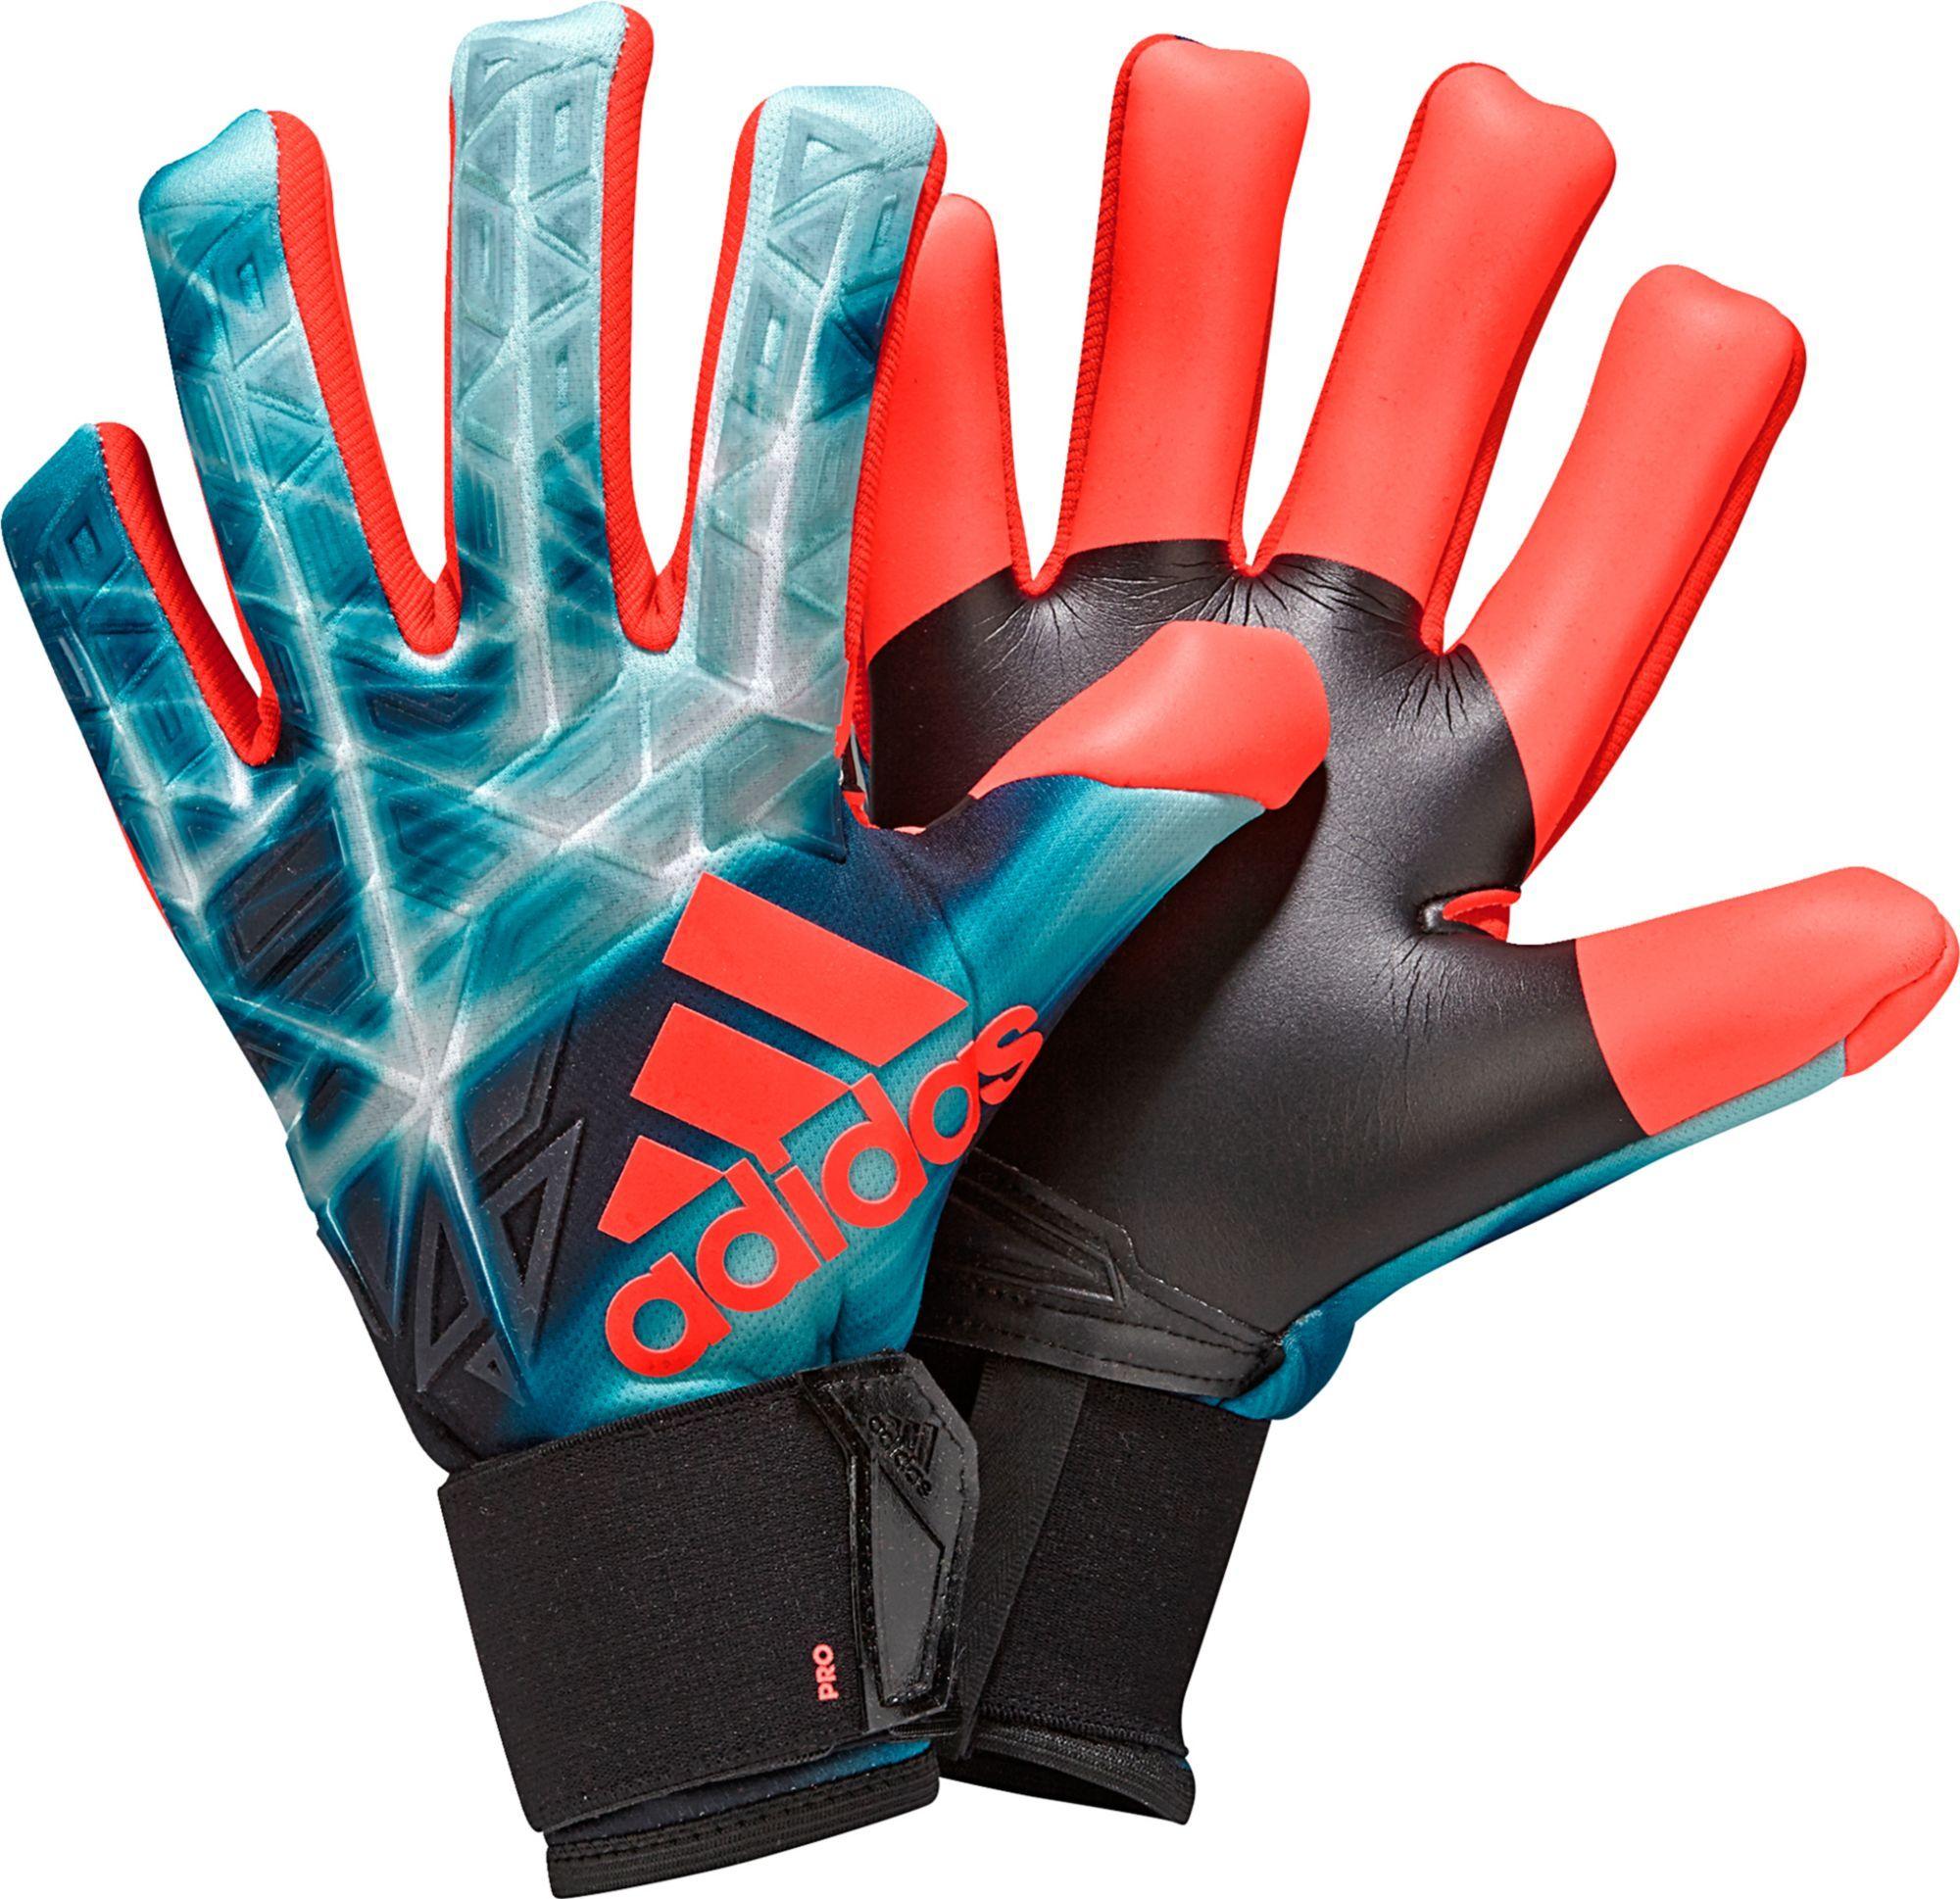 the latest 9419d e1d3a adidas Ace Trans Pro Manuel Neuer Soccer Goalkeeper Gloves ...